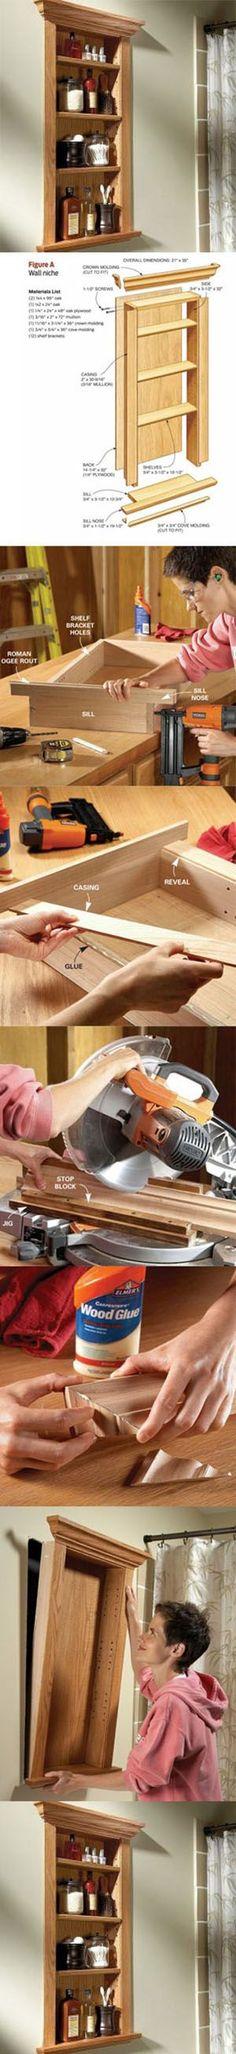 Great Home Decor Idea   DIY & Crafts Tutorials